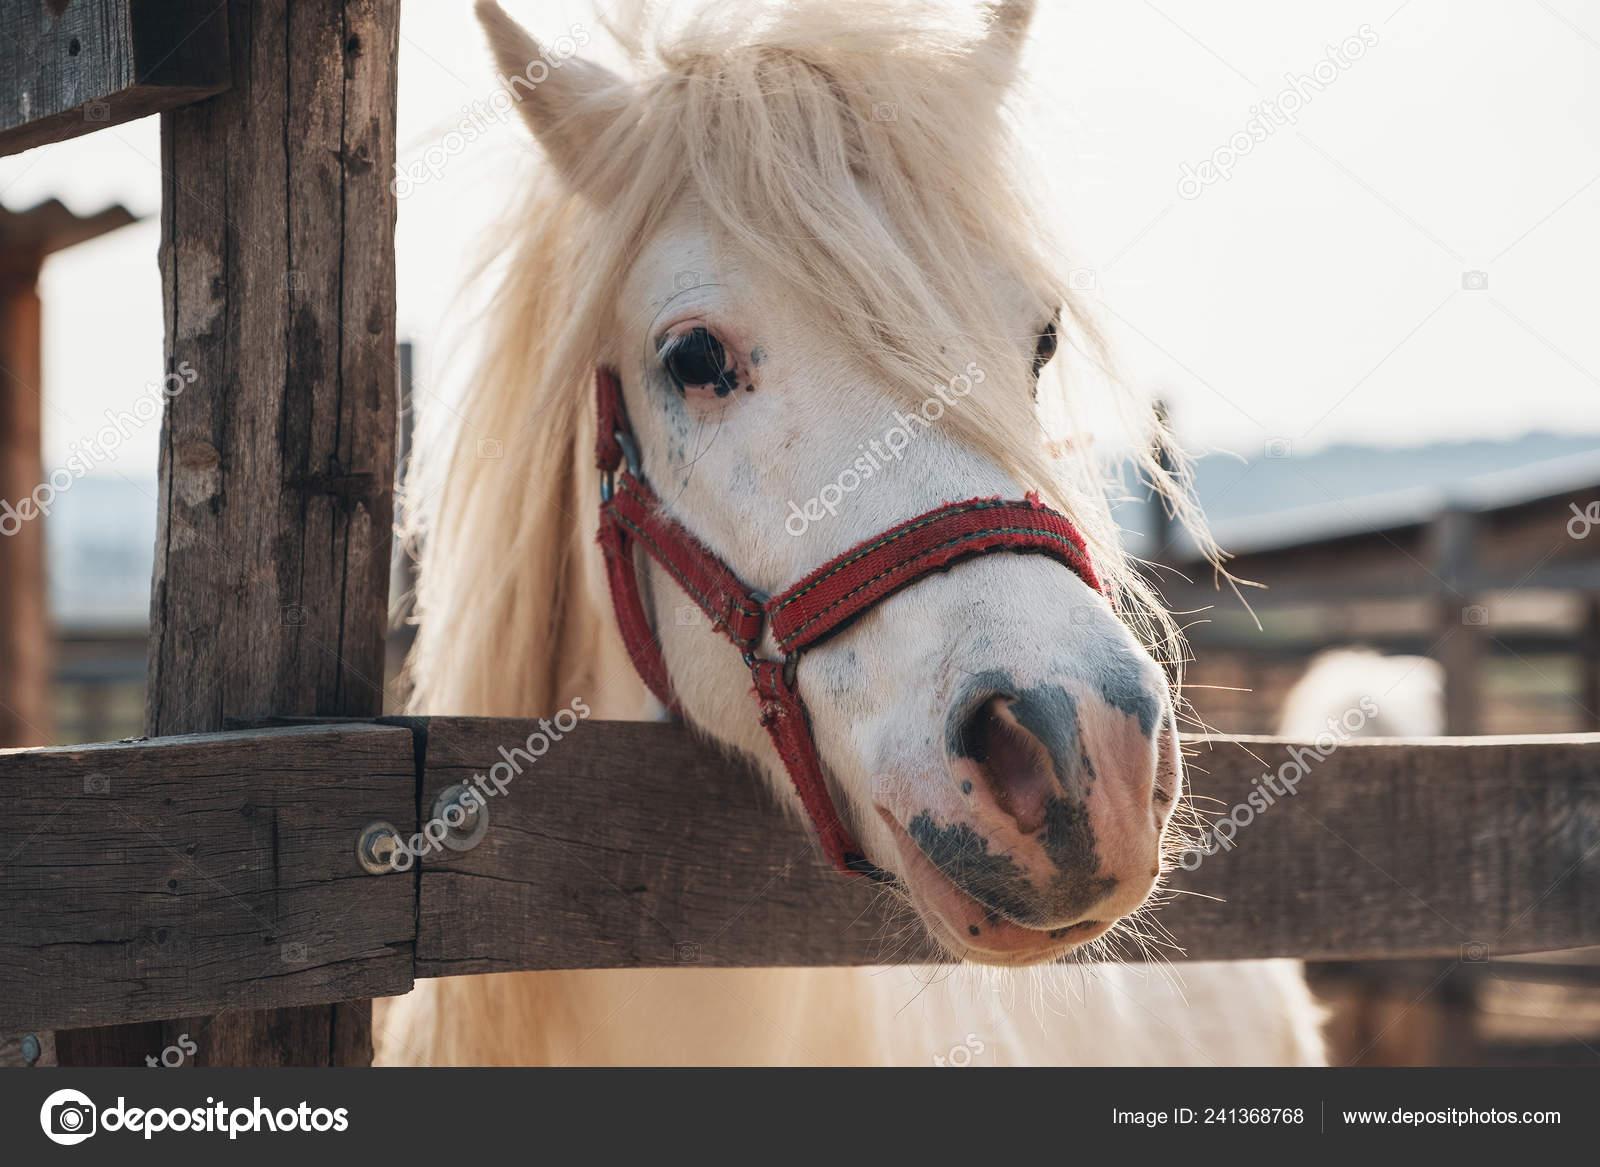 Pictures Cutest Horse Portrait Beautiful White Cute Horse Cutest White Horse Portrait Lovely Stock Photo C Diignat 241368768